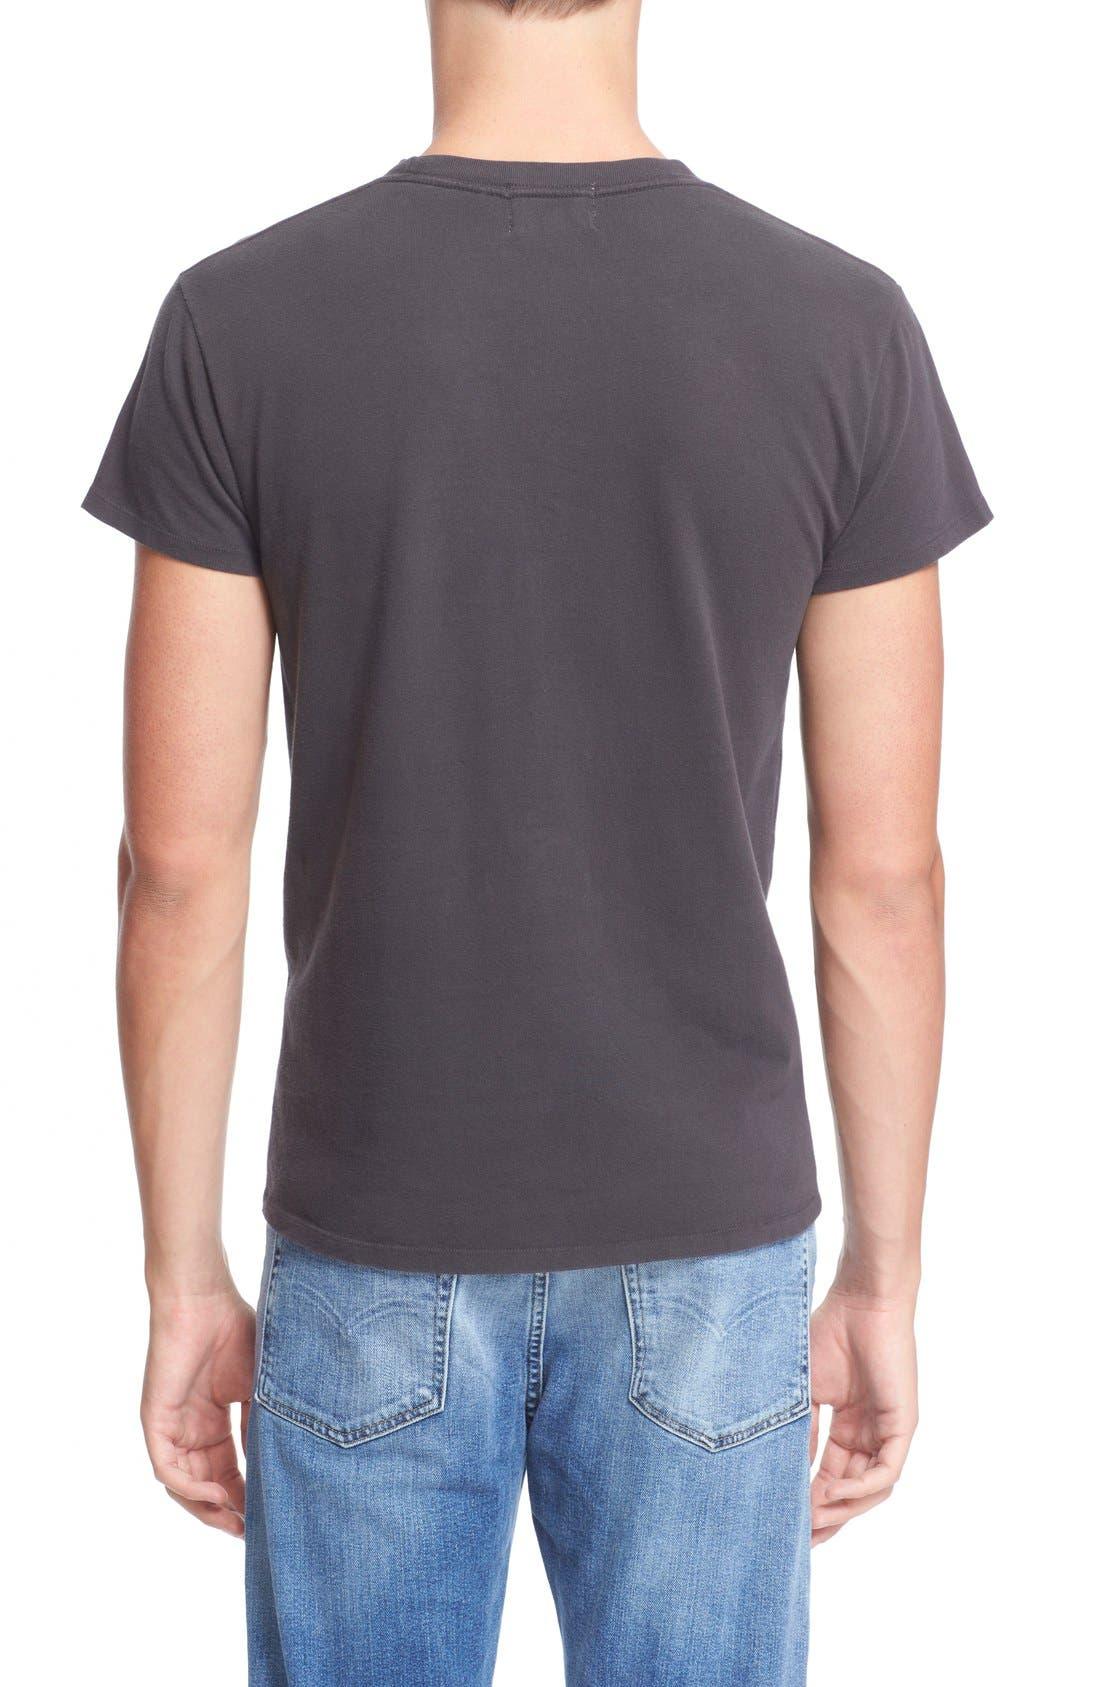 Levi's Vintage Clothing '1950s' Pocket T-Shirt,                             Alternate thumbnail 2, color,                             001